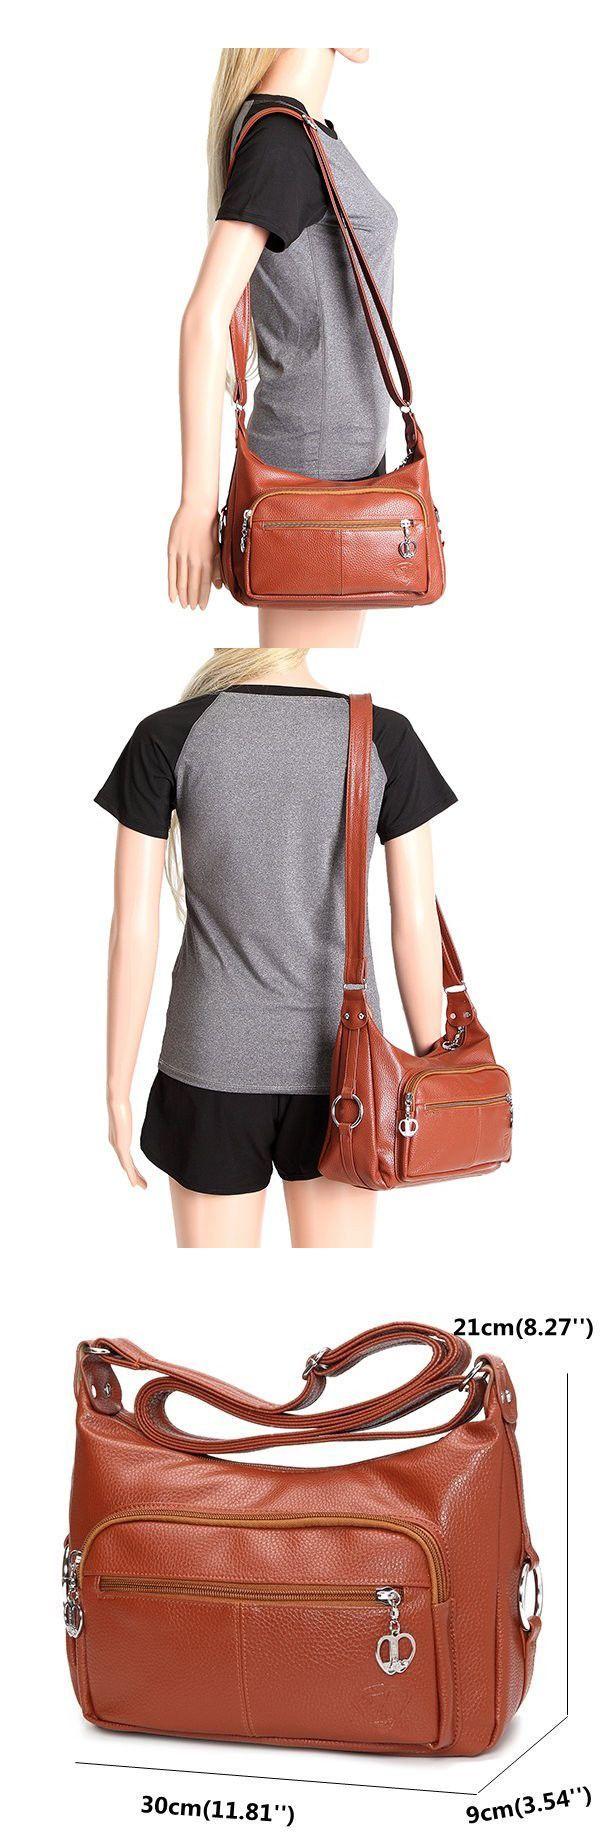 a4ac0a534844 ... cheapest fashiontote  leathercuteschoolmessengercrossbodypatternshouldersatchelvintagebeach  canvassmallshoppingaccu2026 handbags prada e7848 7801c